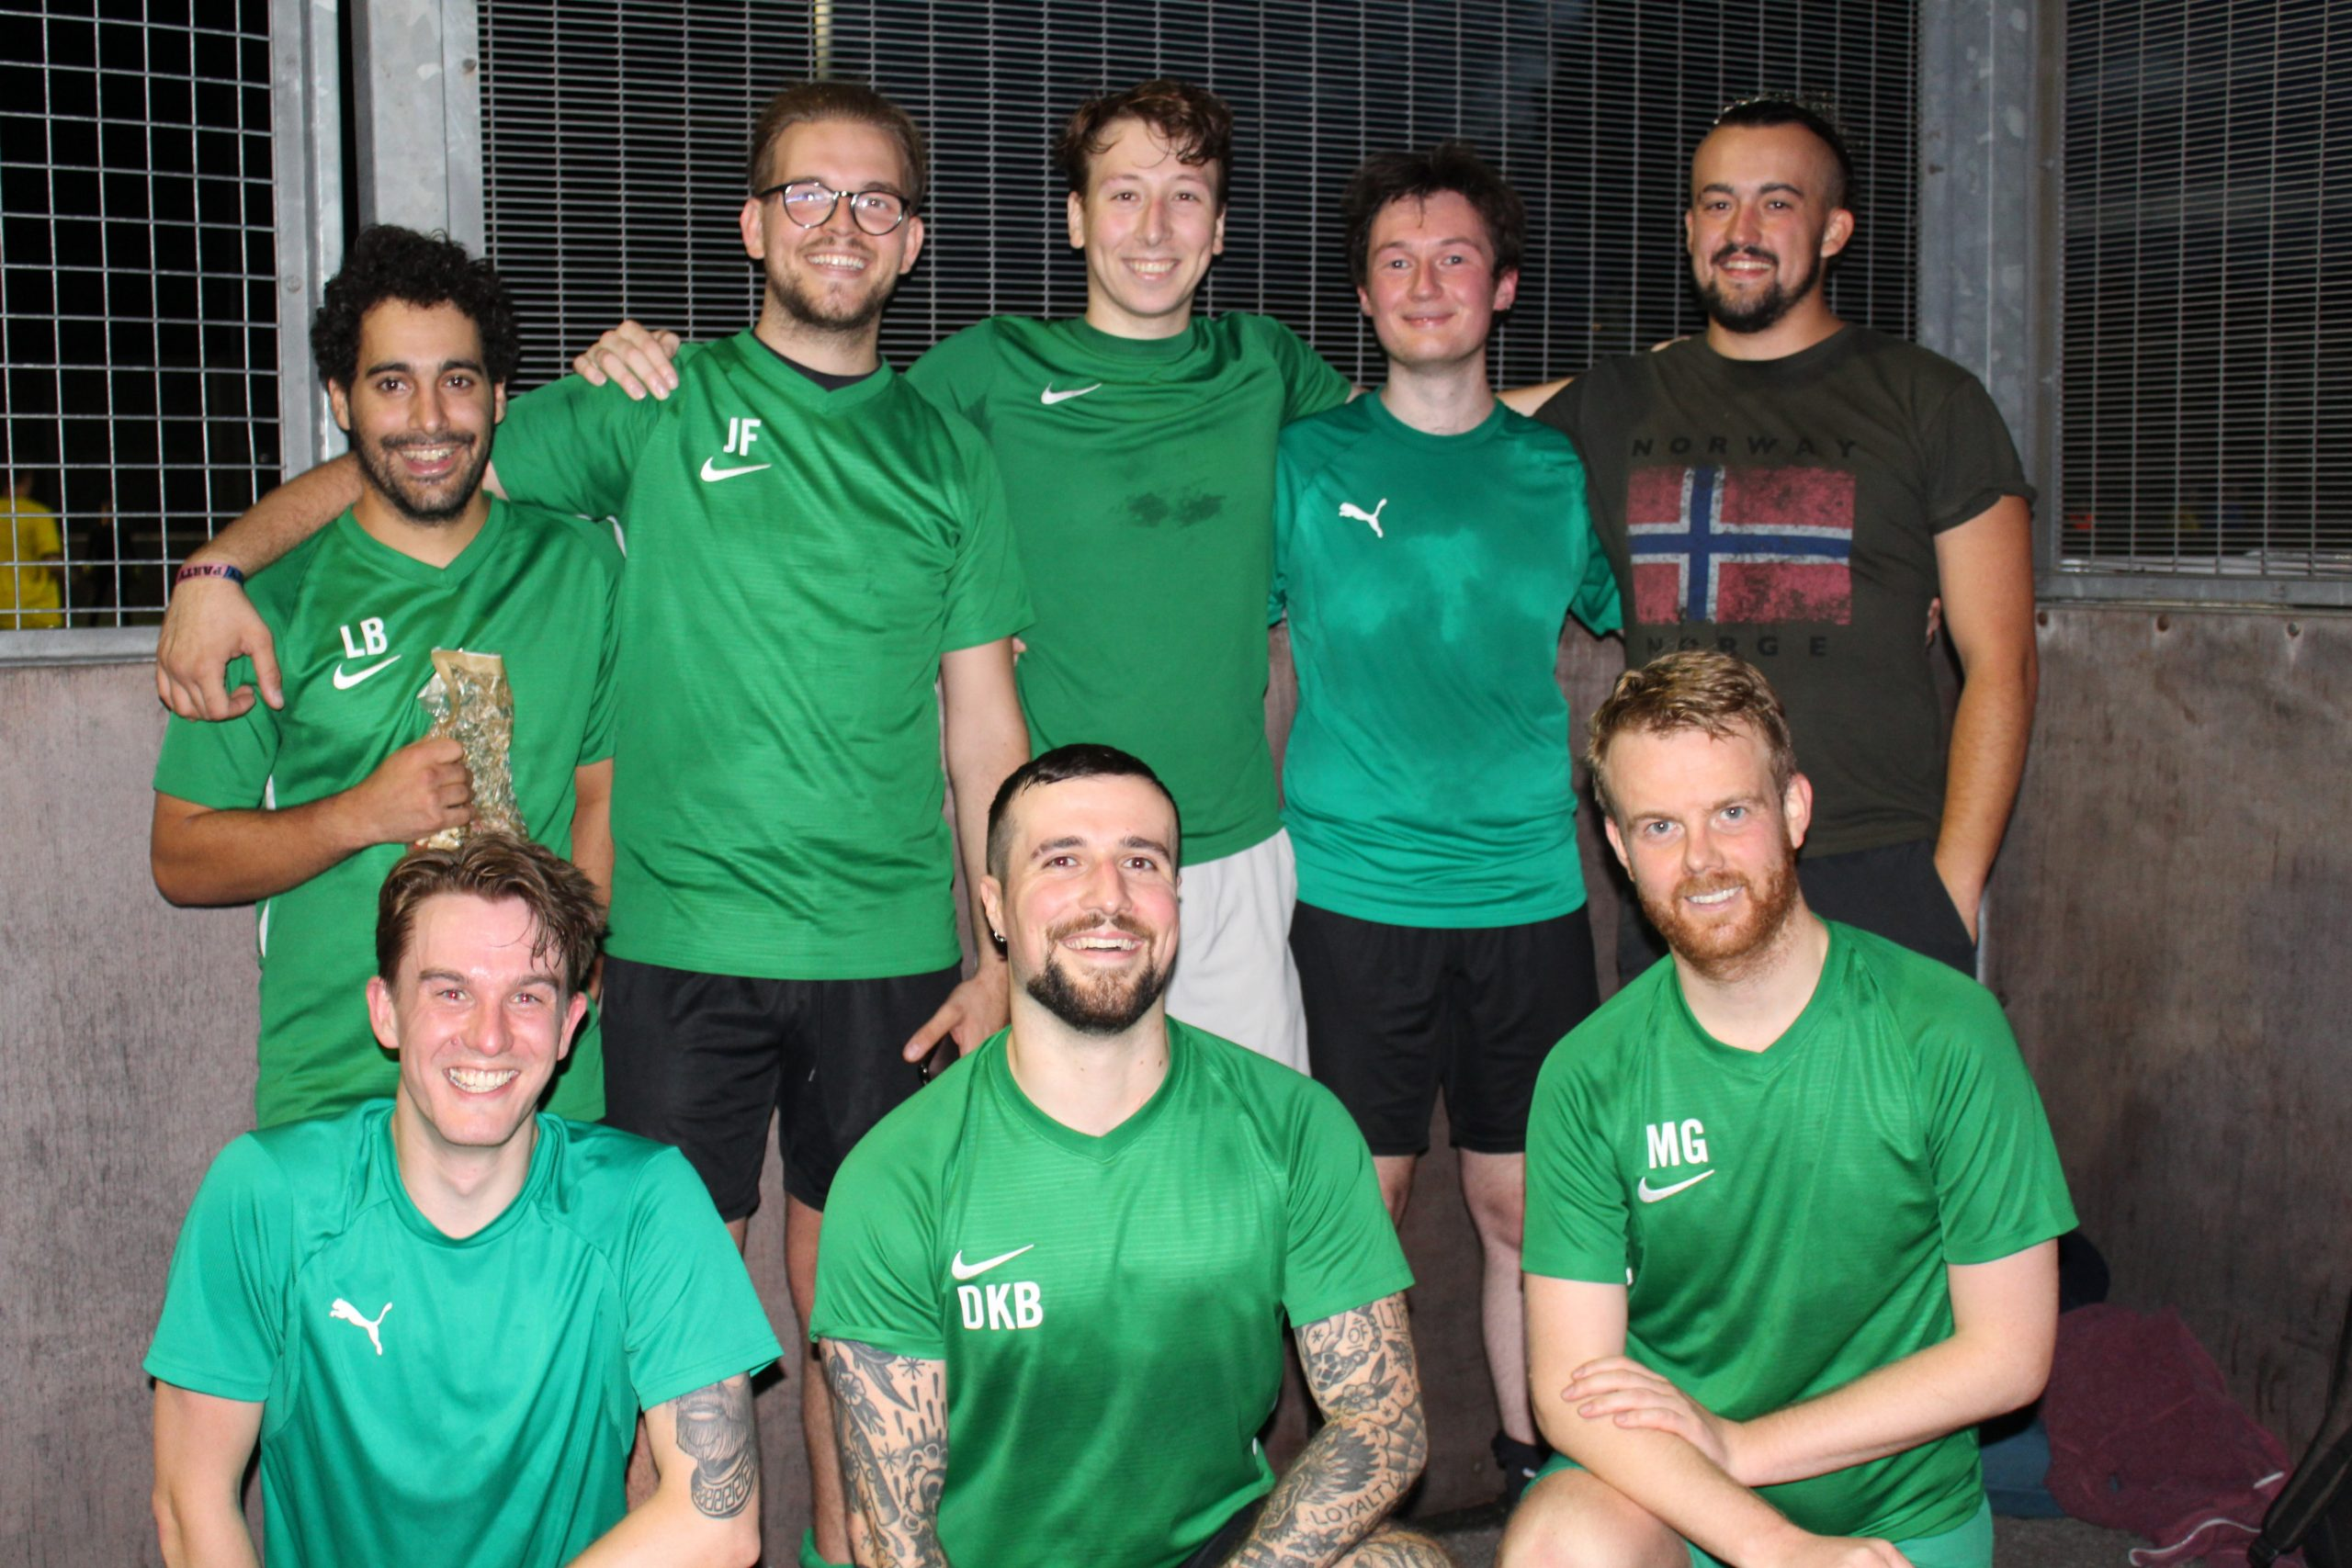 Vegan football team Kale Madrid gain sponsorship 2